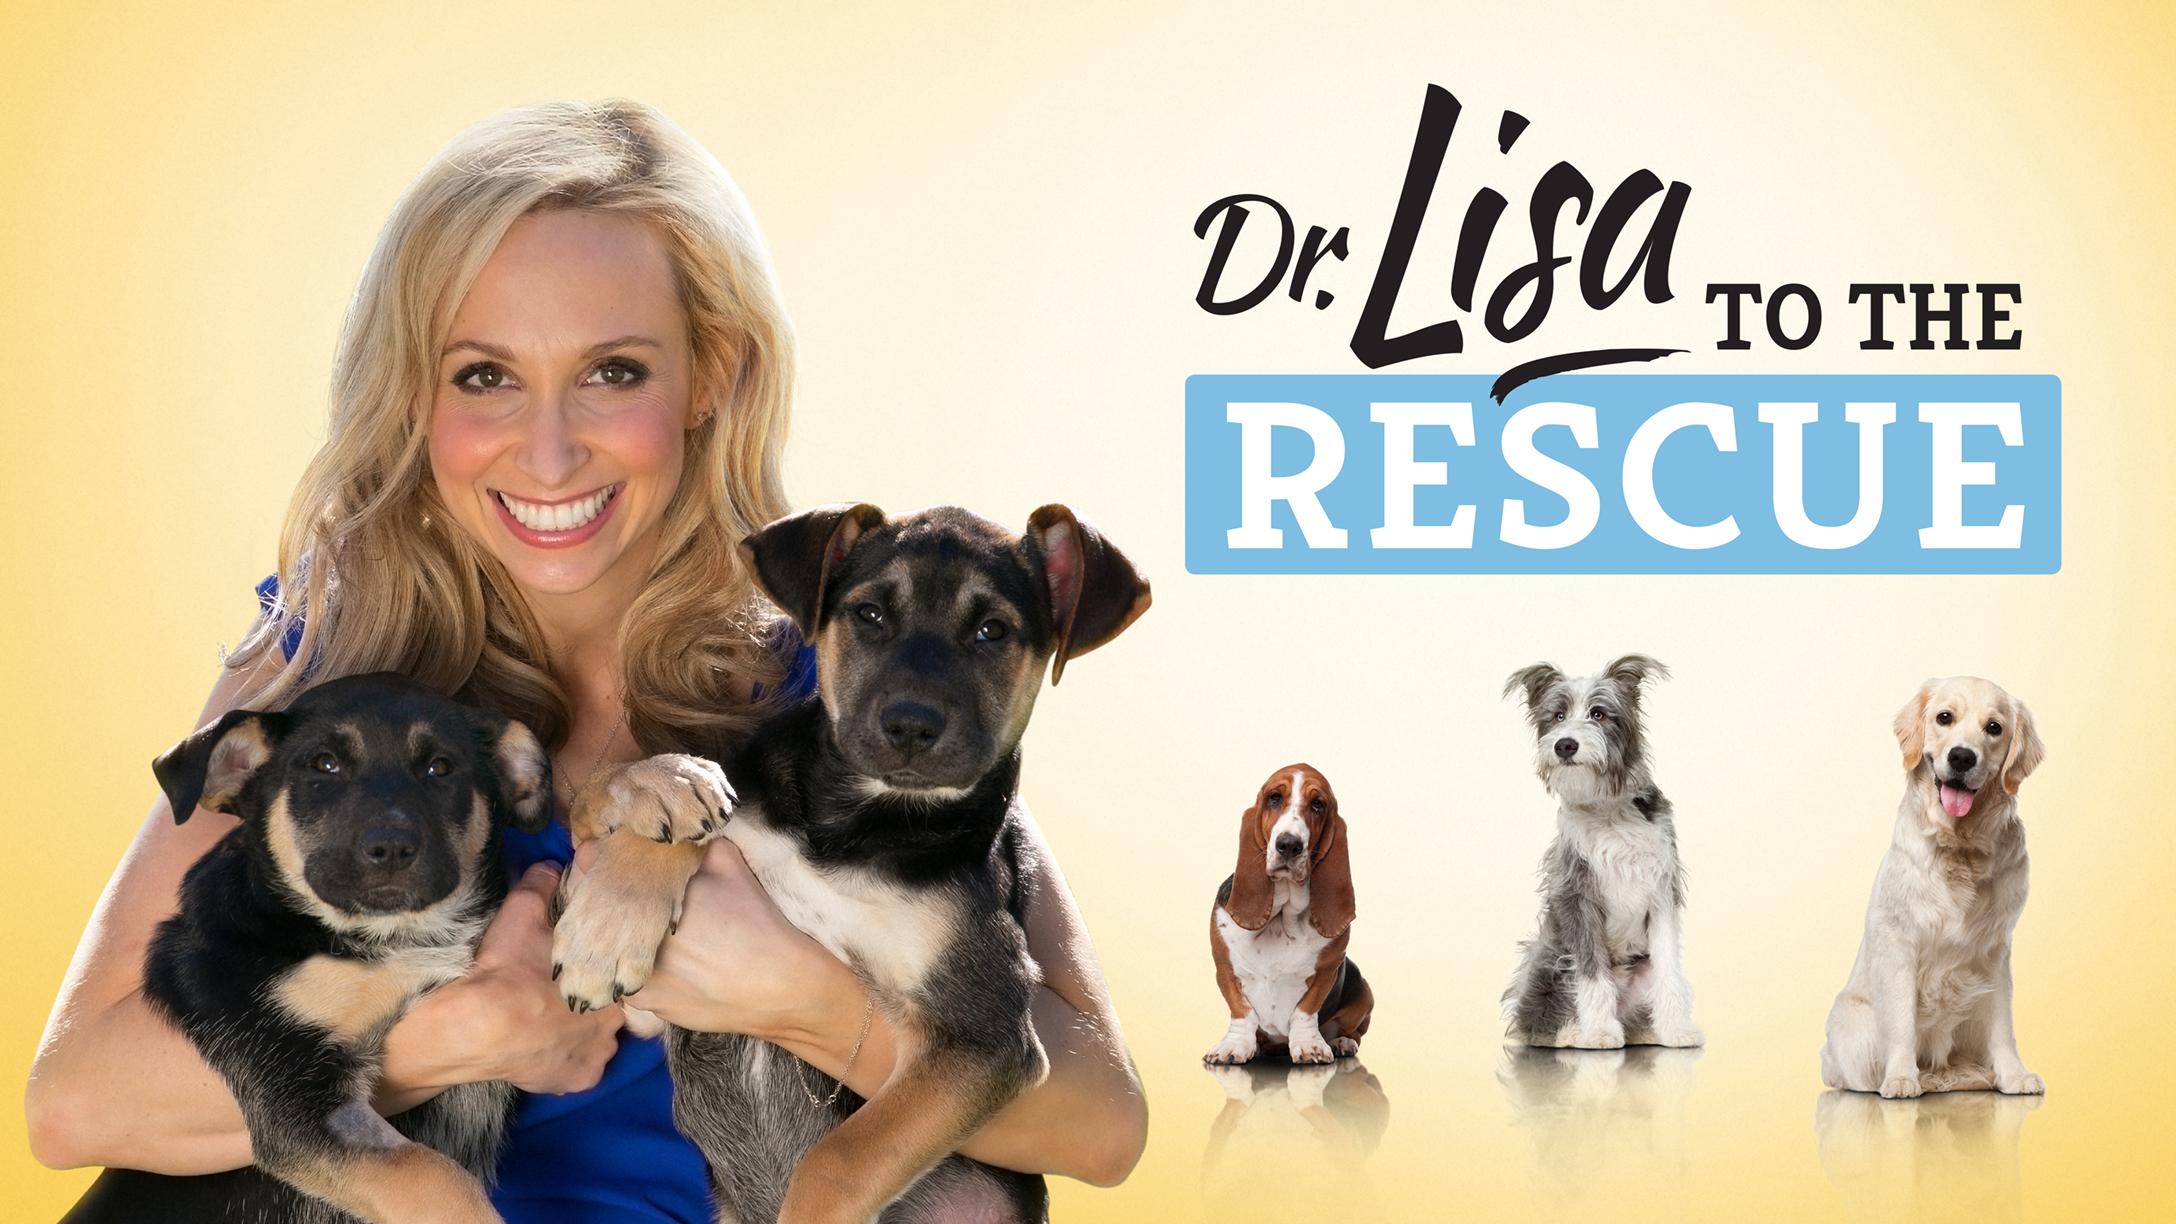 Dr Lisa to the Rescue S1 Key Art 16x9 logo 2176x1224